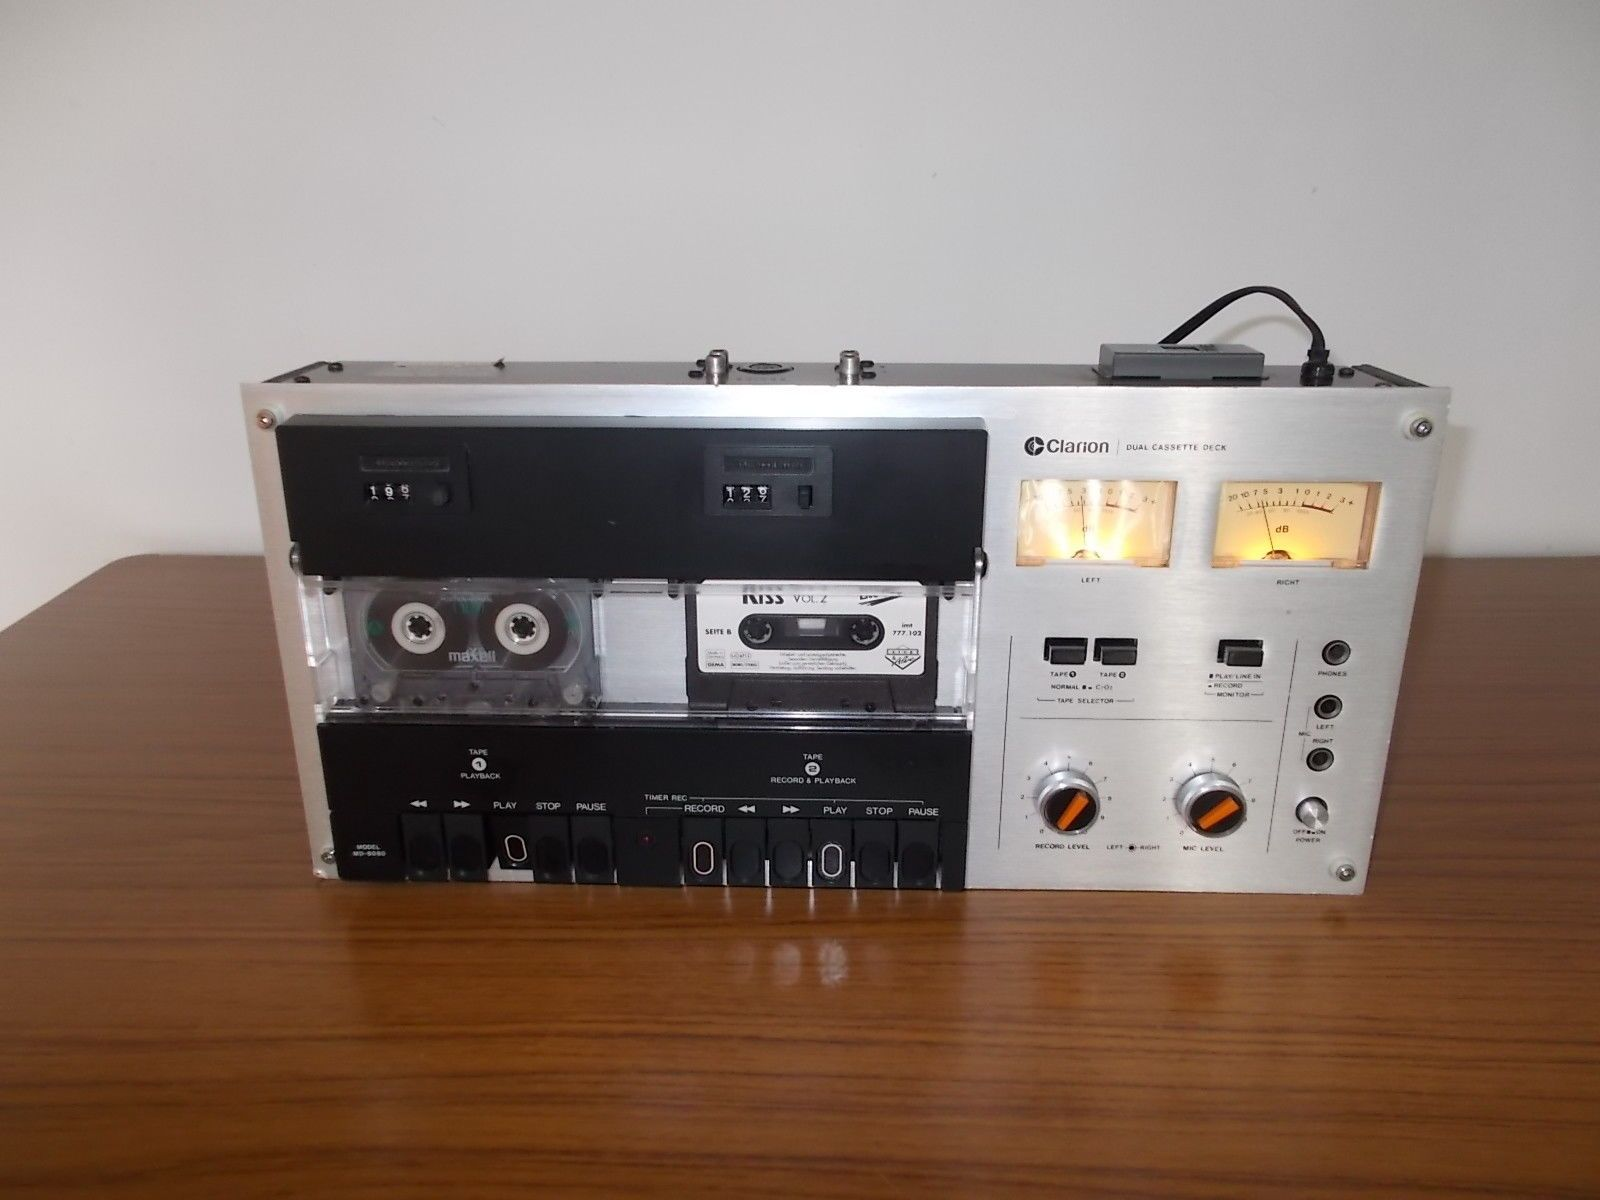 MD8080 AUDIO 64BIT DRIVER